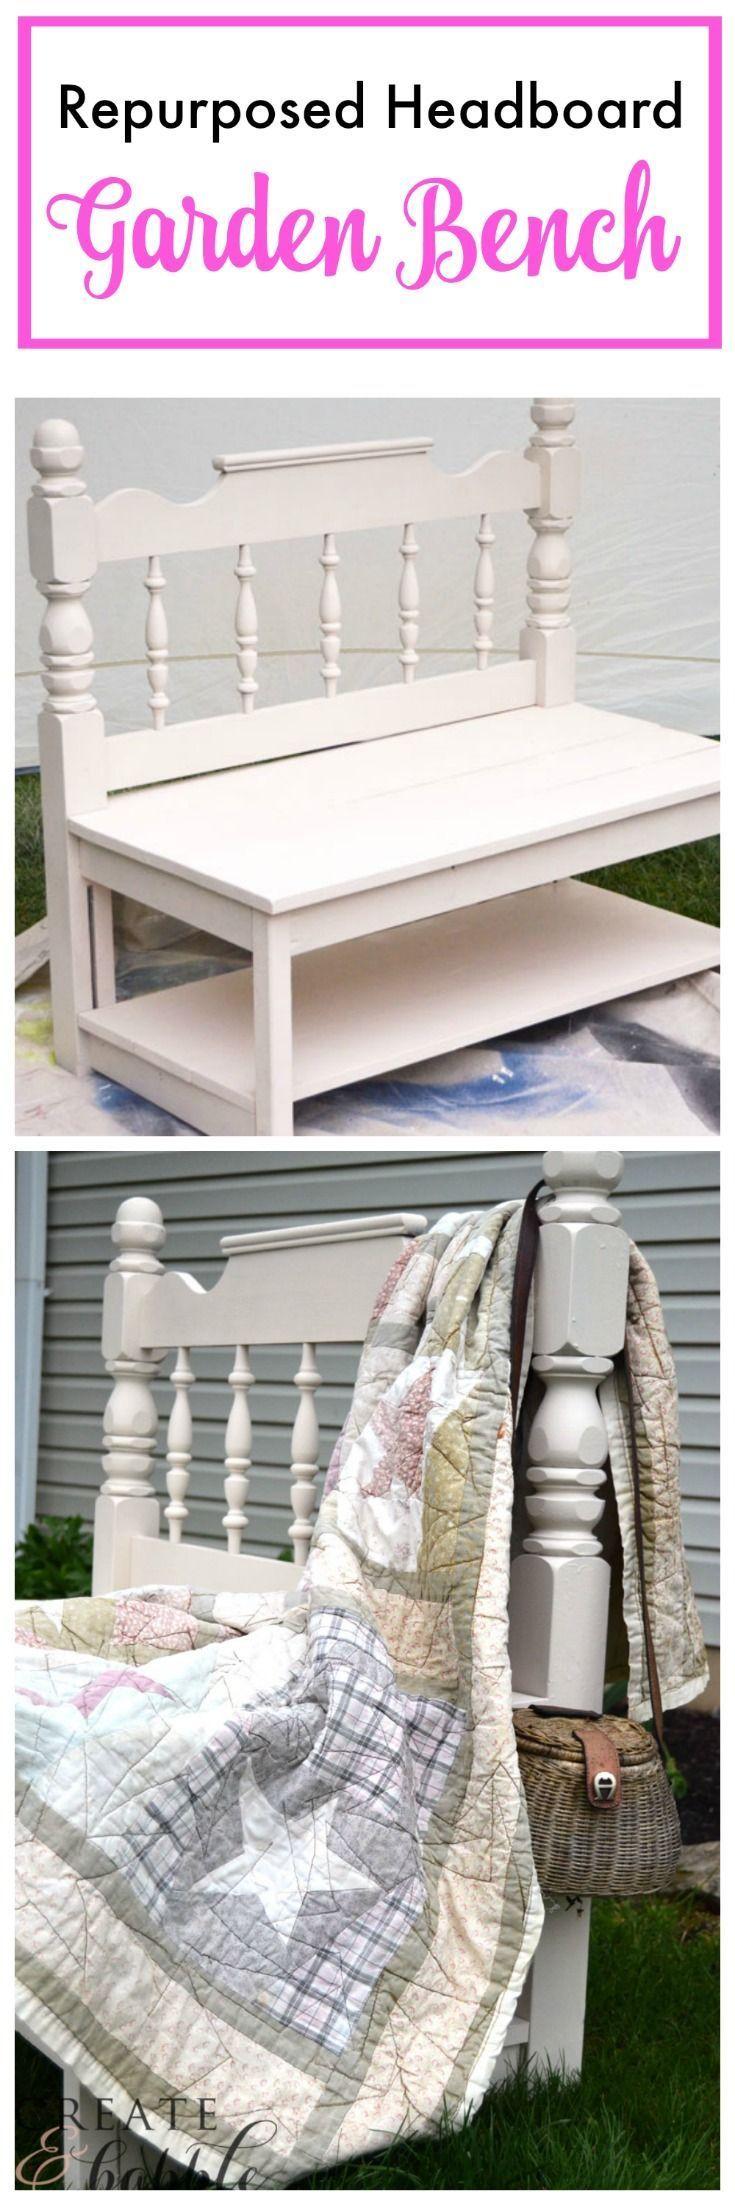 Let me show you how to repurpose a headboard into pretty garden bench | repurpose | DIY